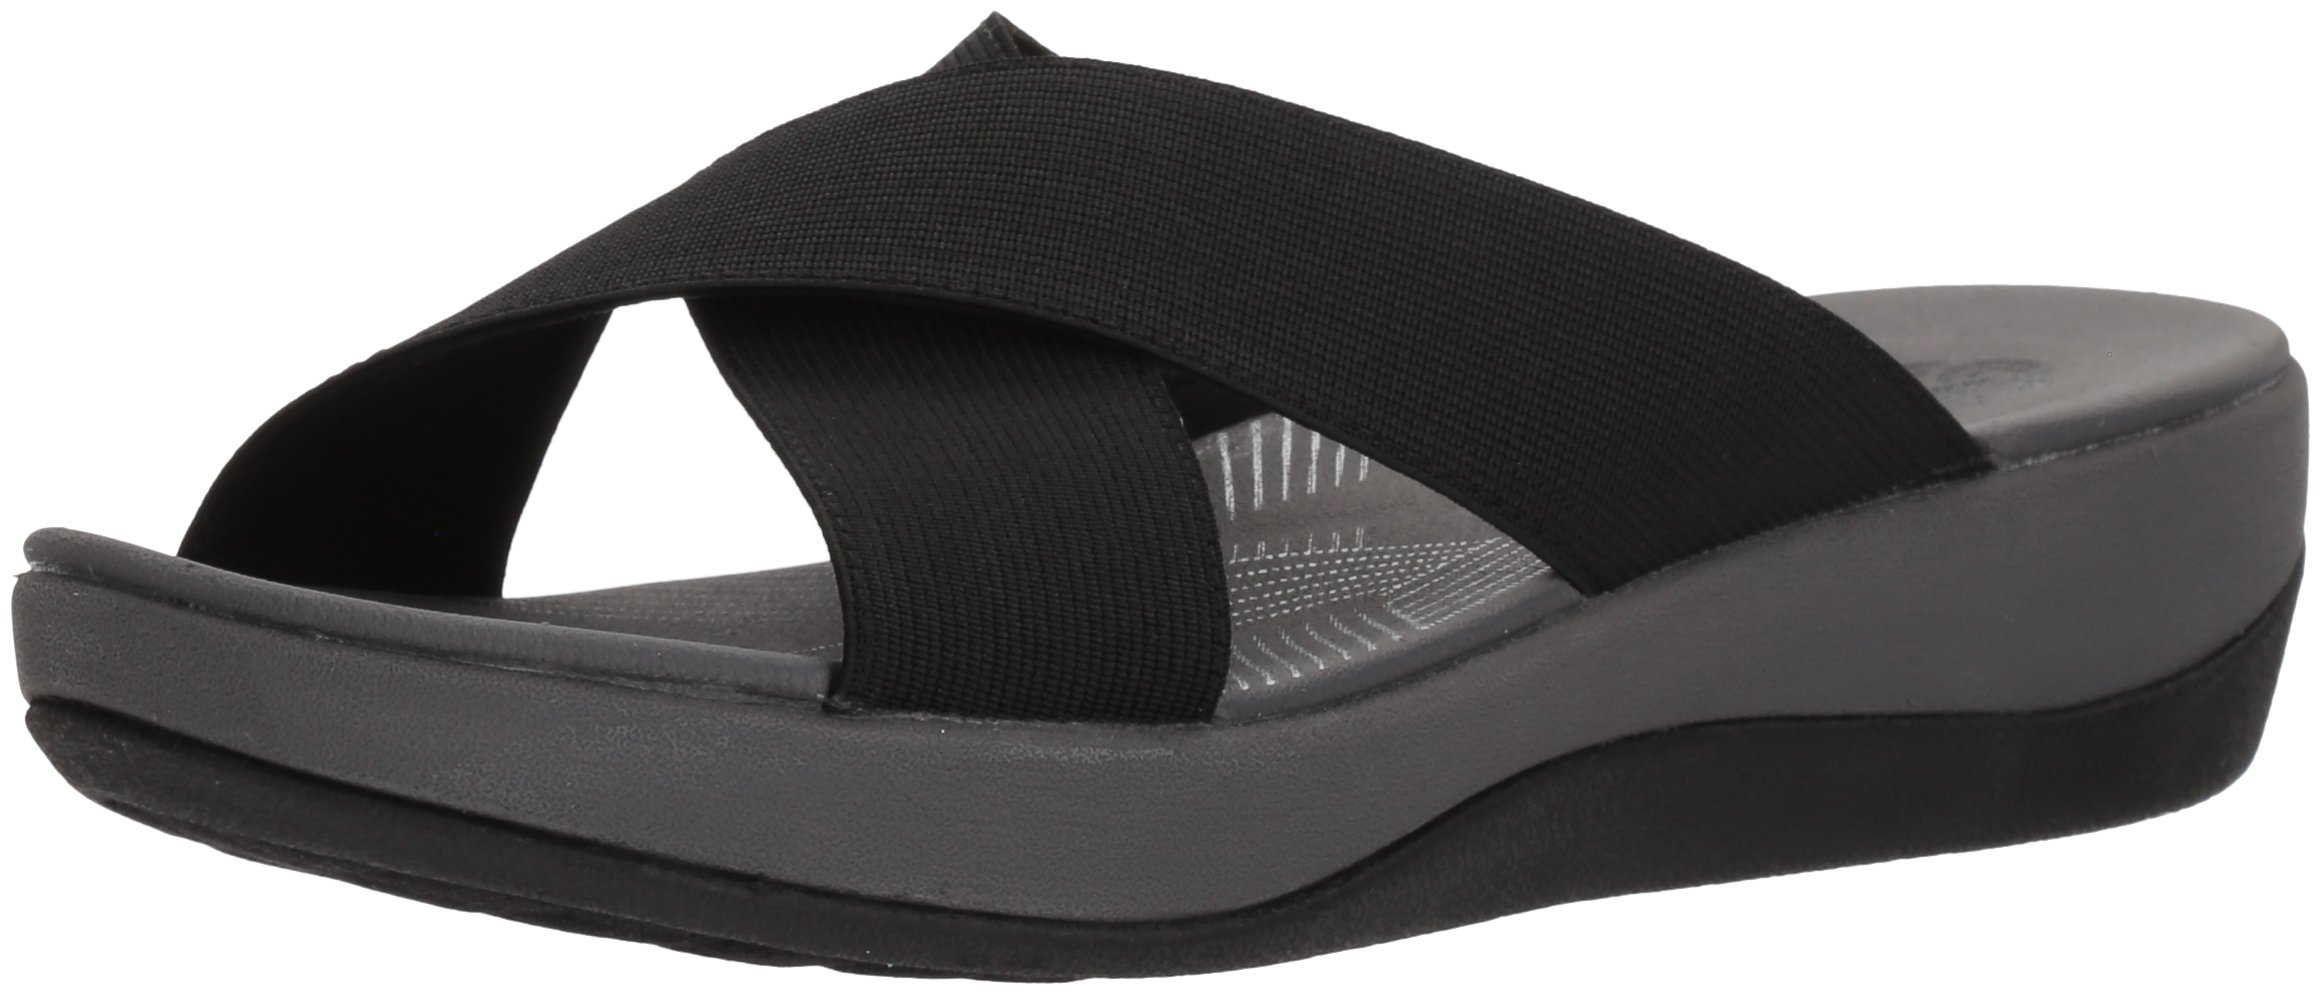 CLARKS Womens Sandal Textile Medium